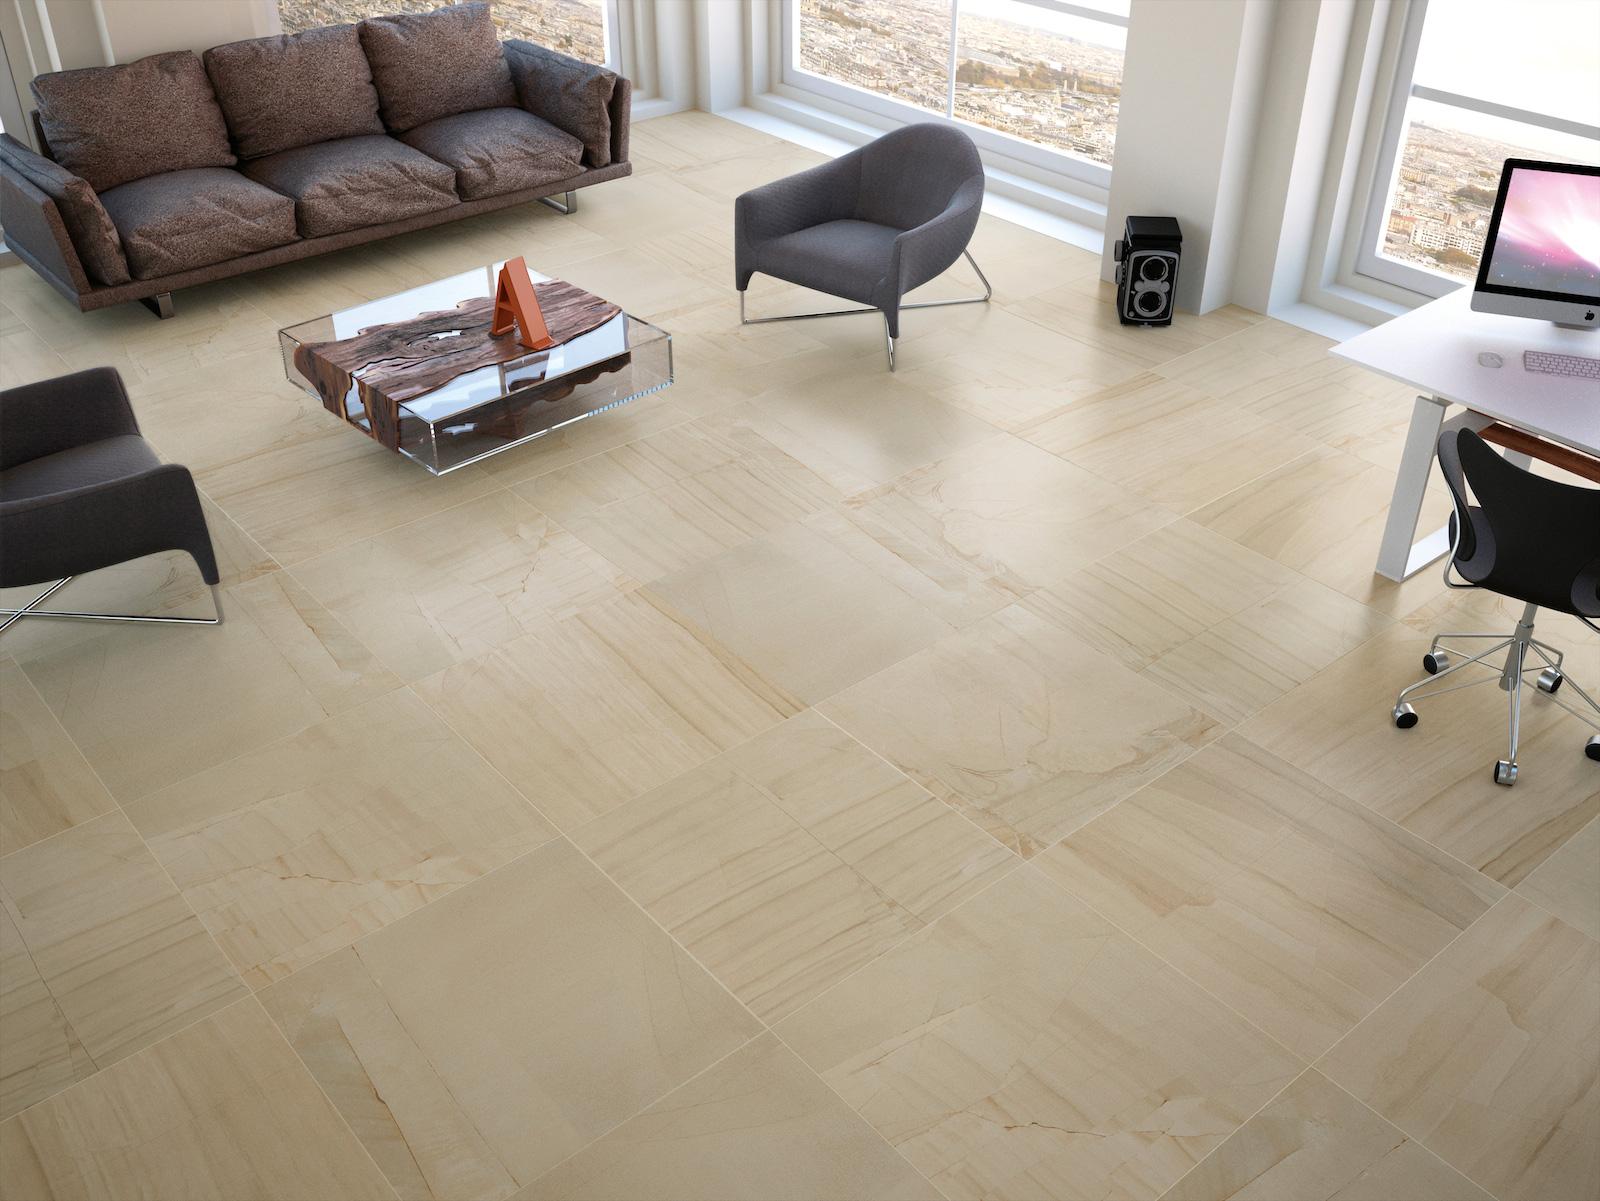 Big tile flooring